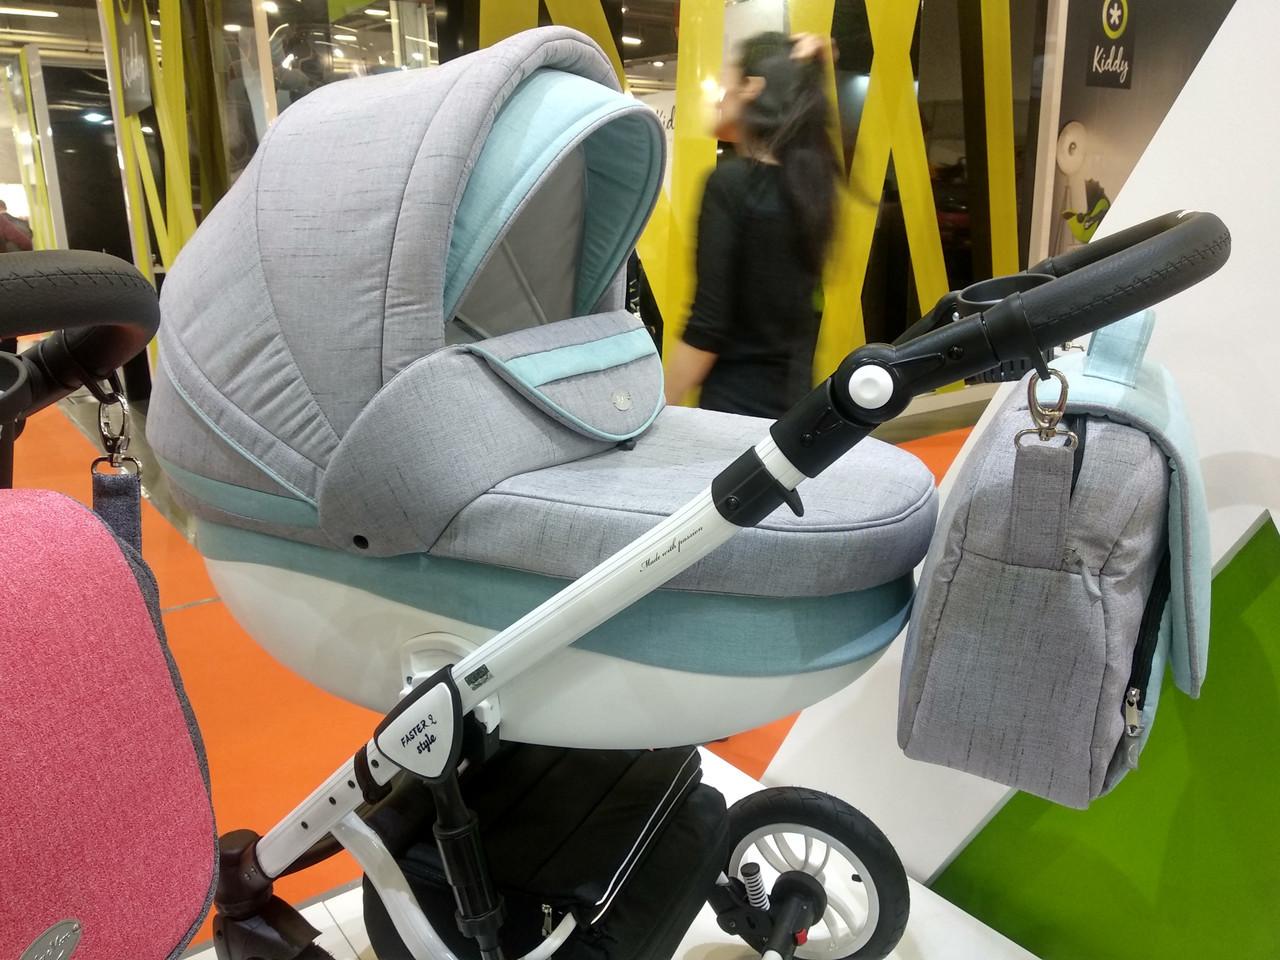 Коляска 2 в 1 Baby Merc Faster Style 2 FII/104 (беби мерс фастер) Бесплатная доставка